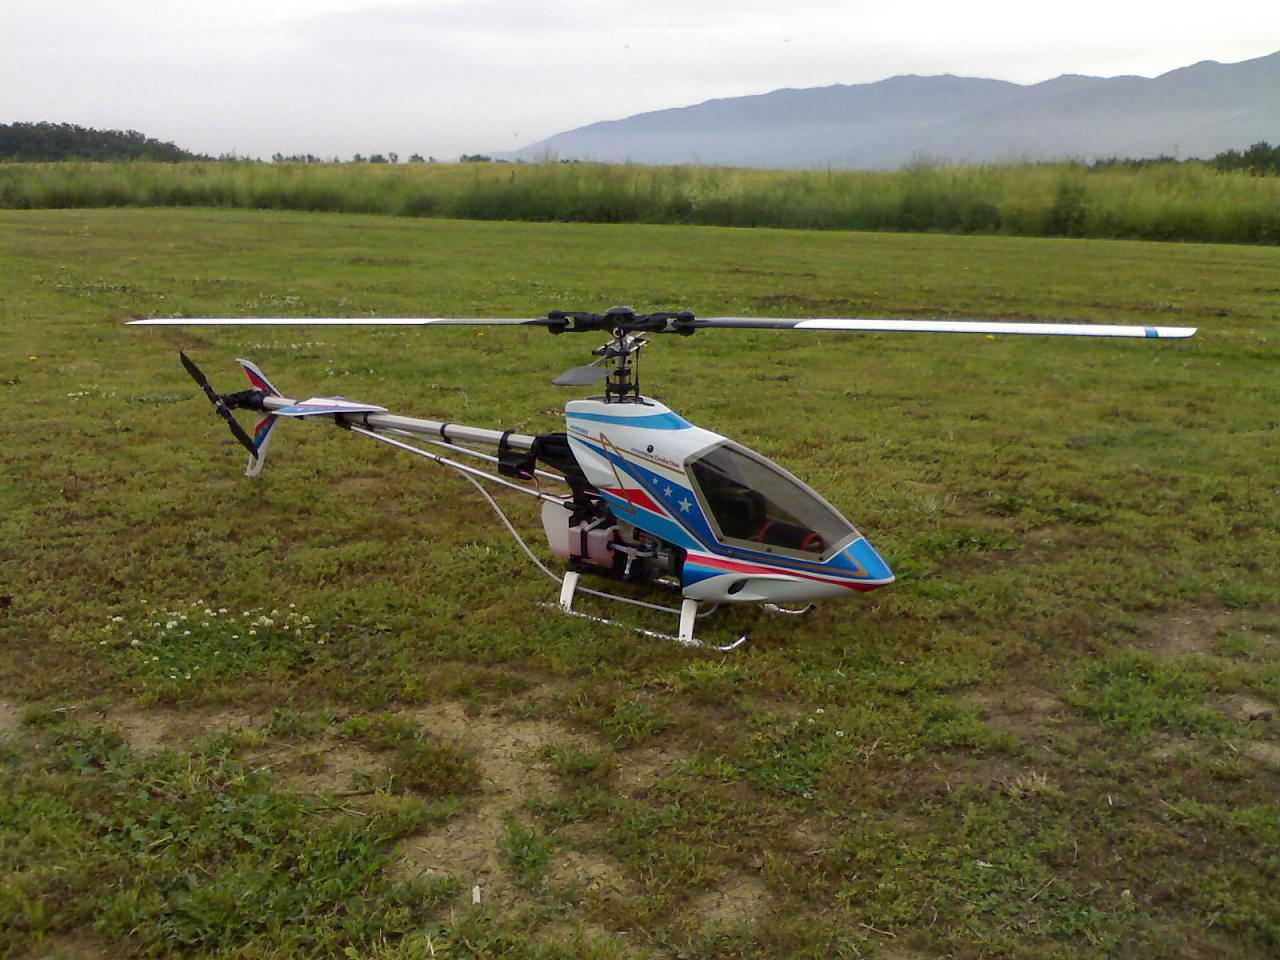 Elicottero Usato : Valutazione usato hirobo freya 90 baronerosso.it forum modellismo